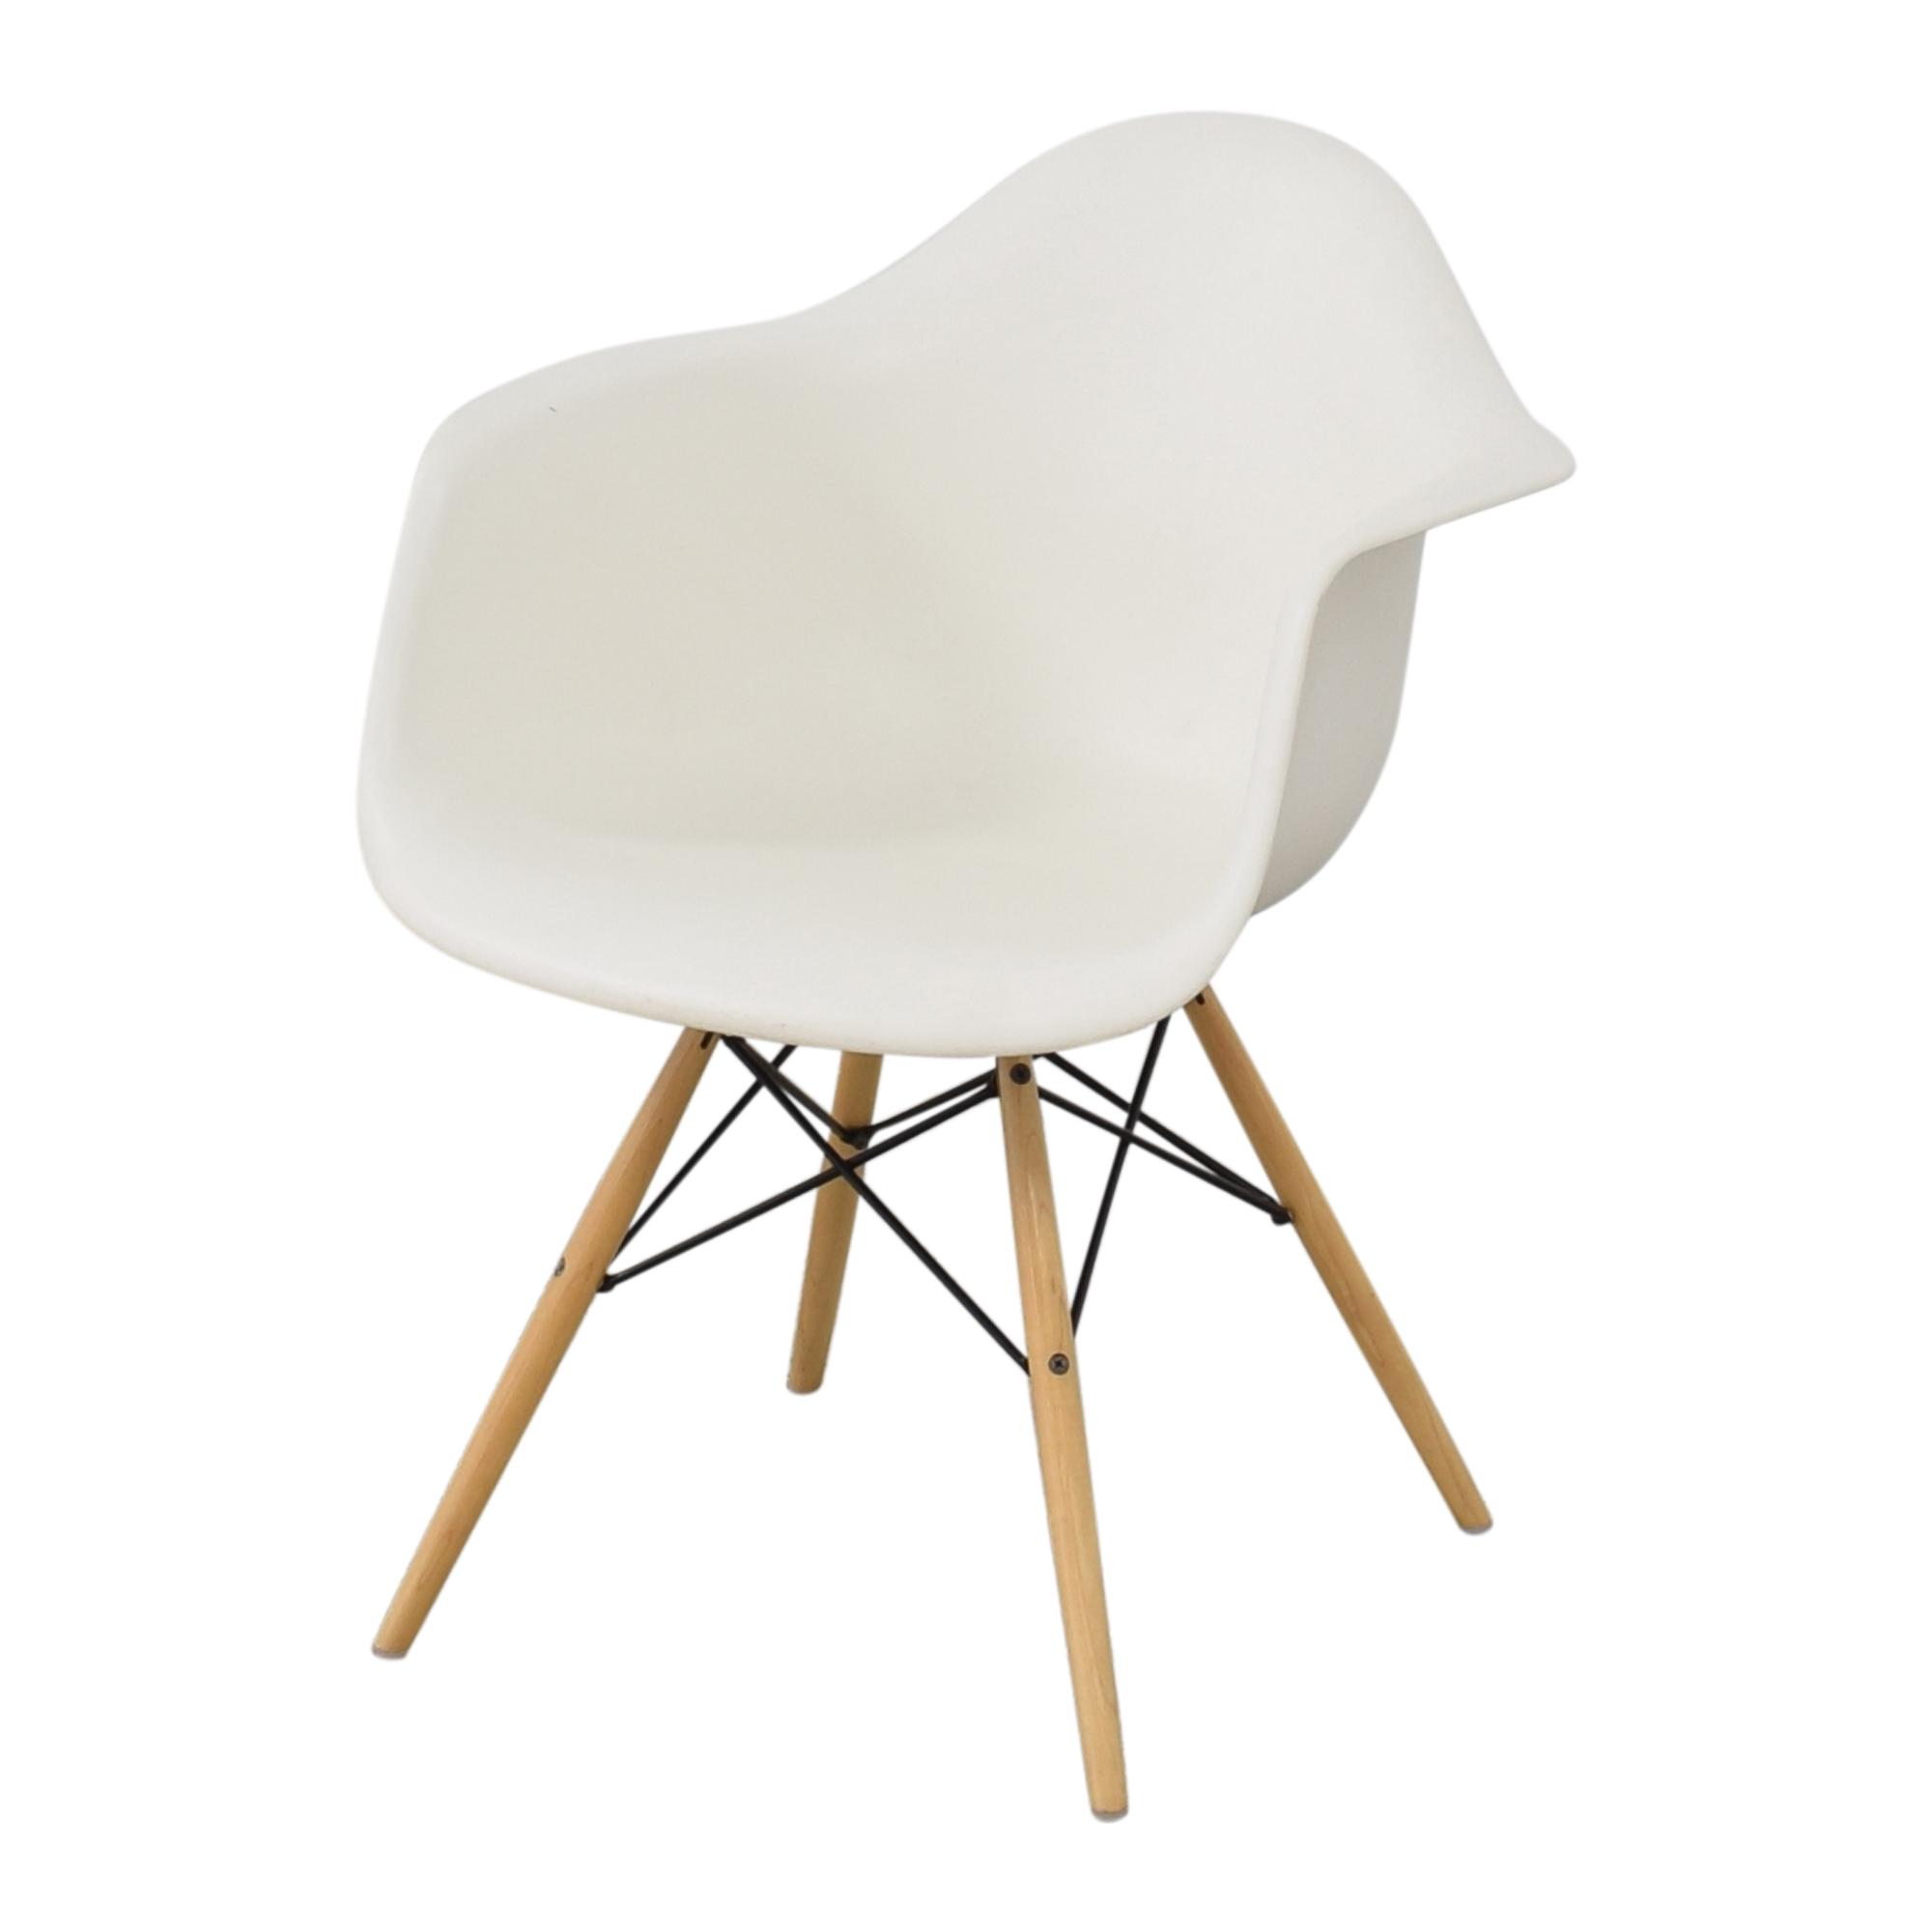 Herman Miller Herman Miller Eames Molded Arm Chair